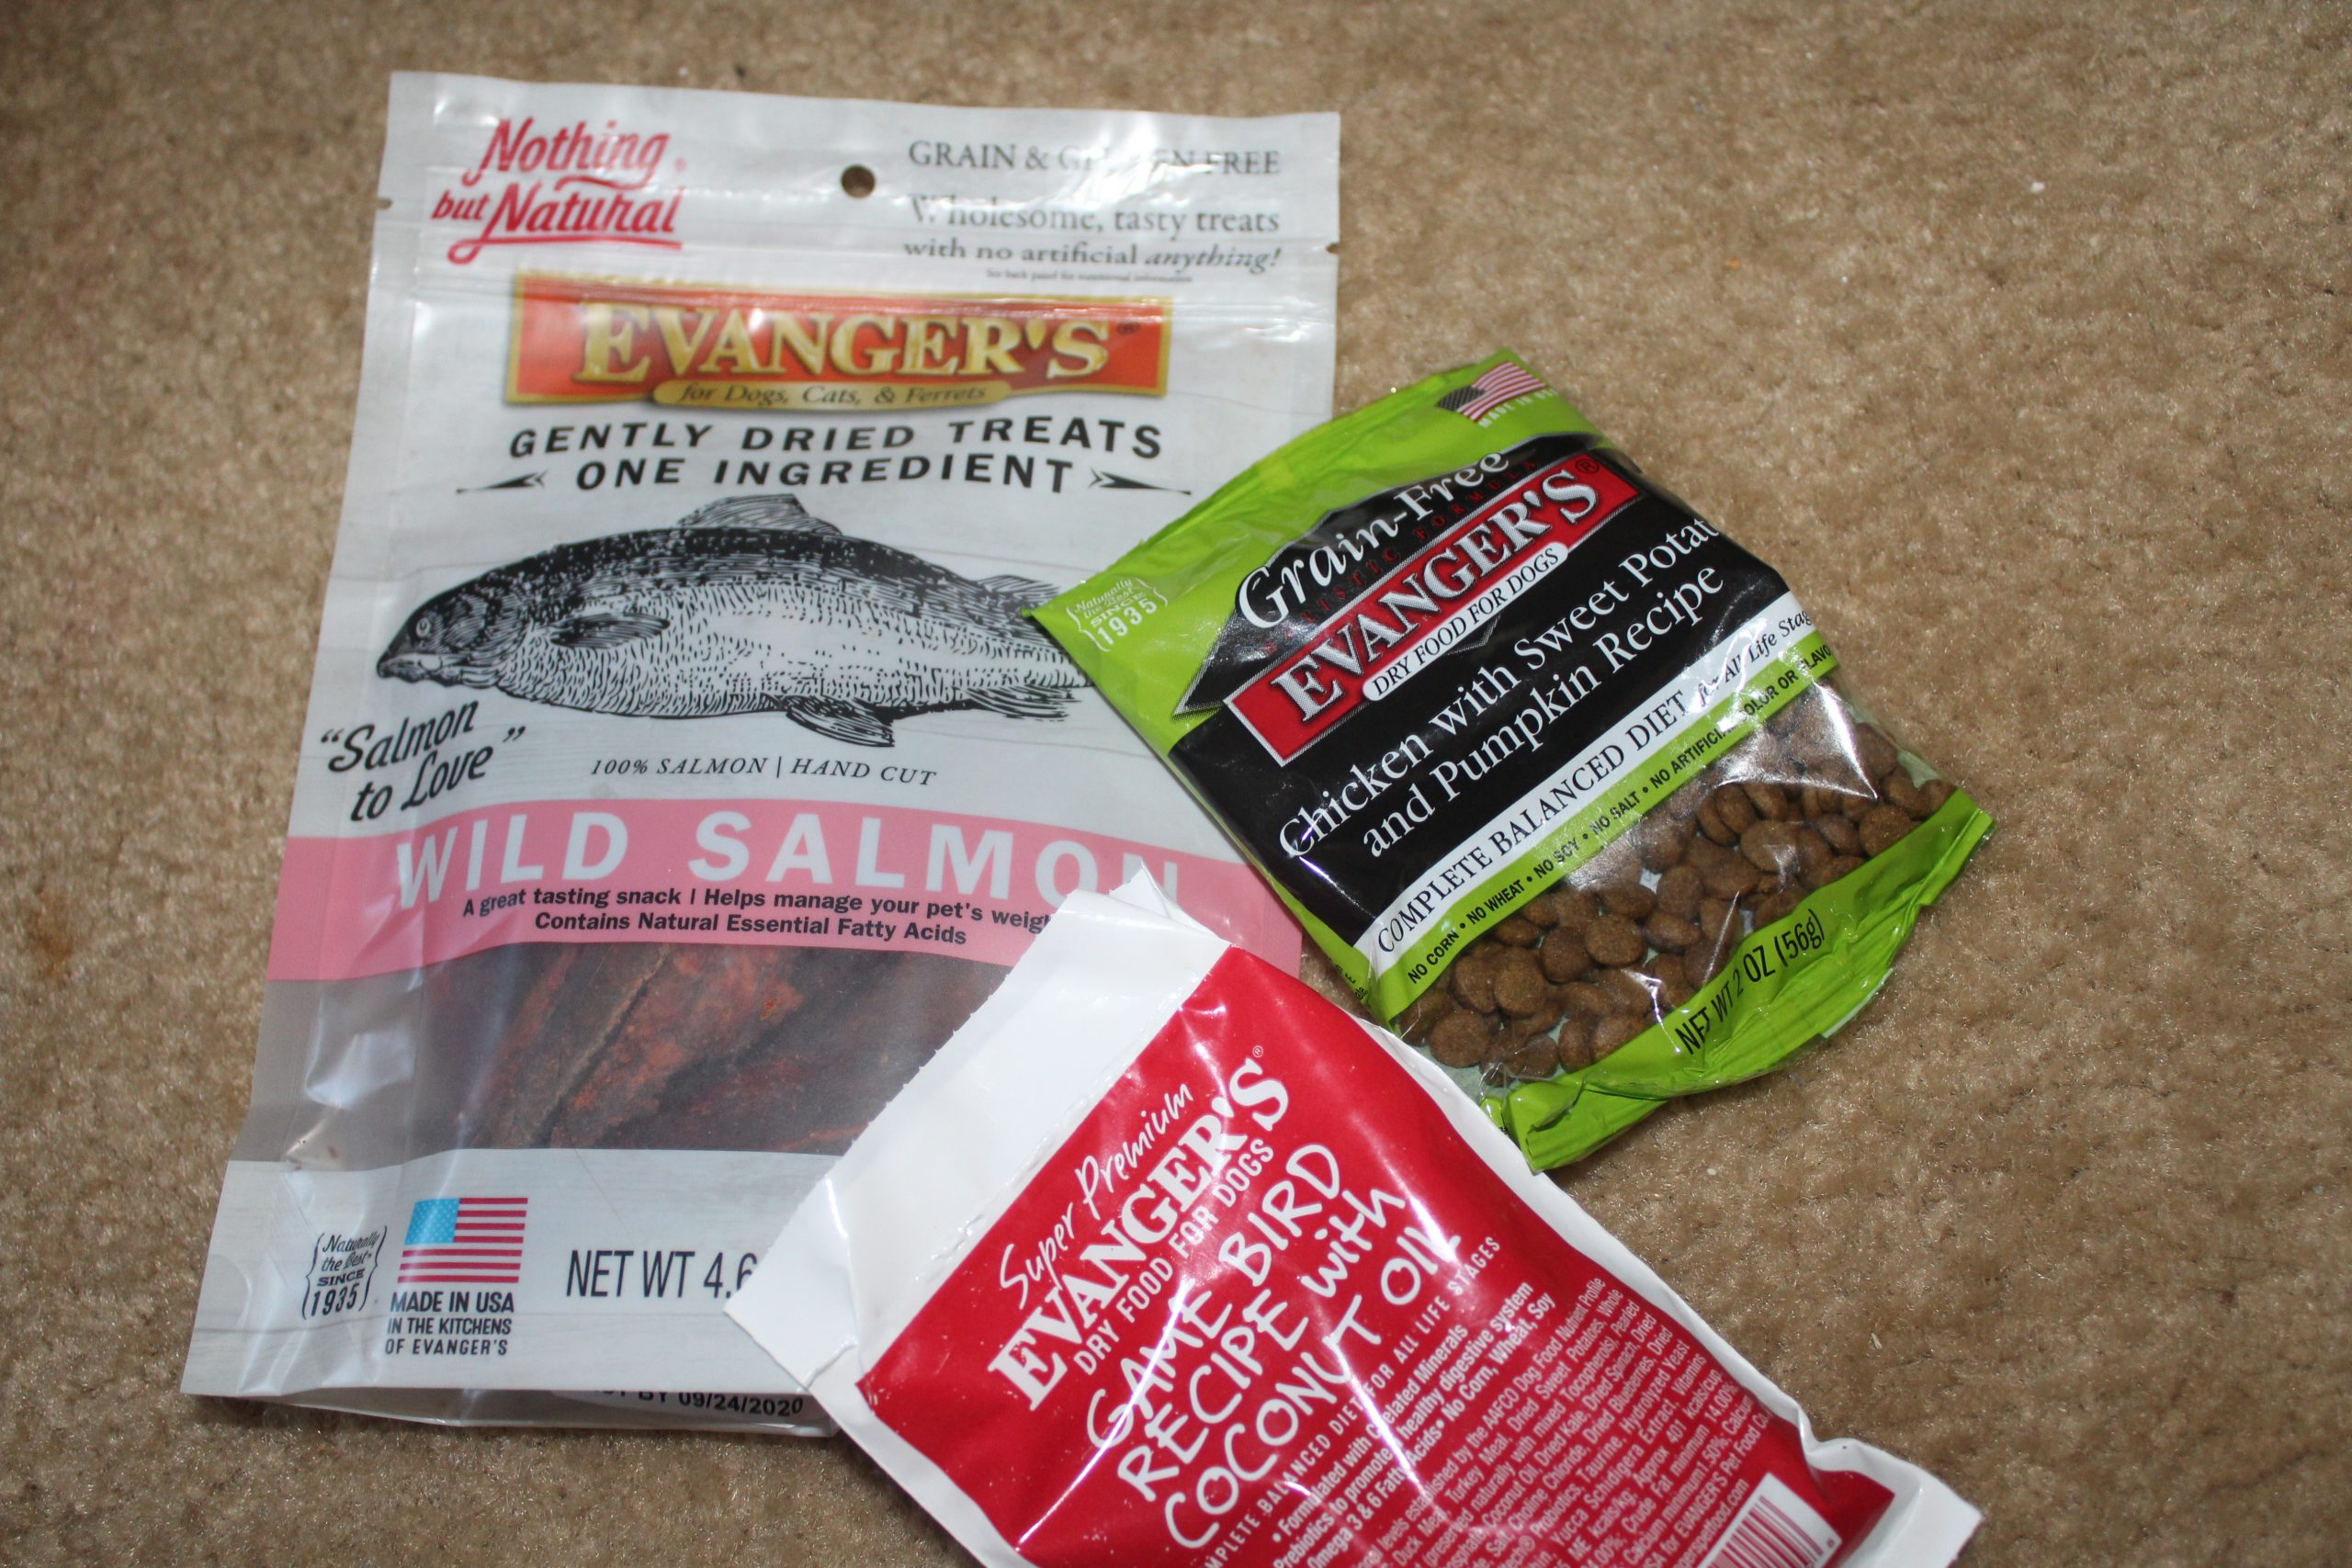 Evanger's Dog & Cat Food & Treats @Evangers @HGG19